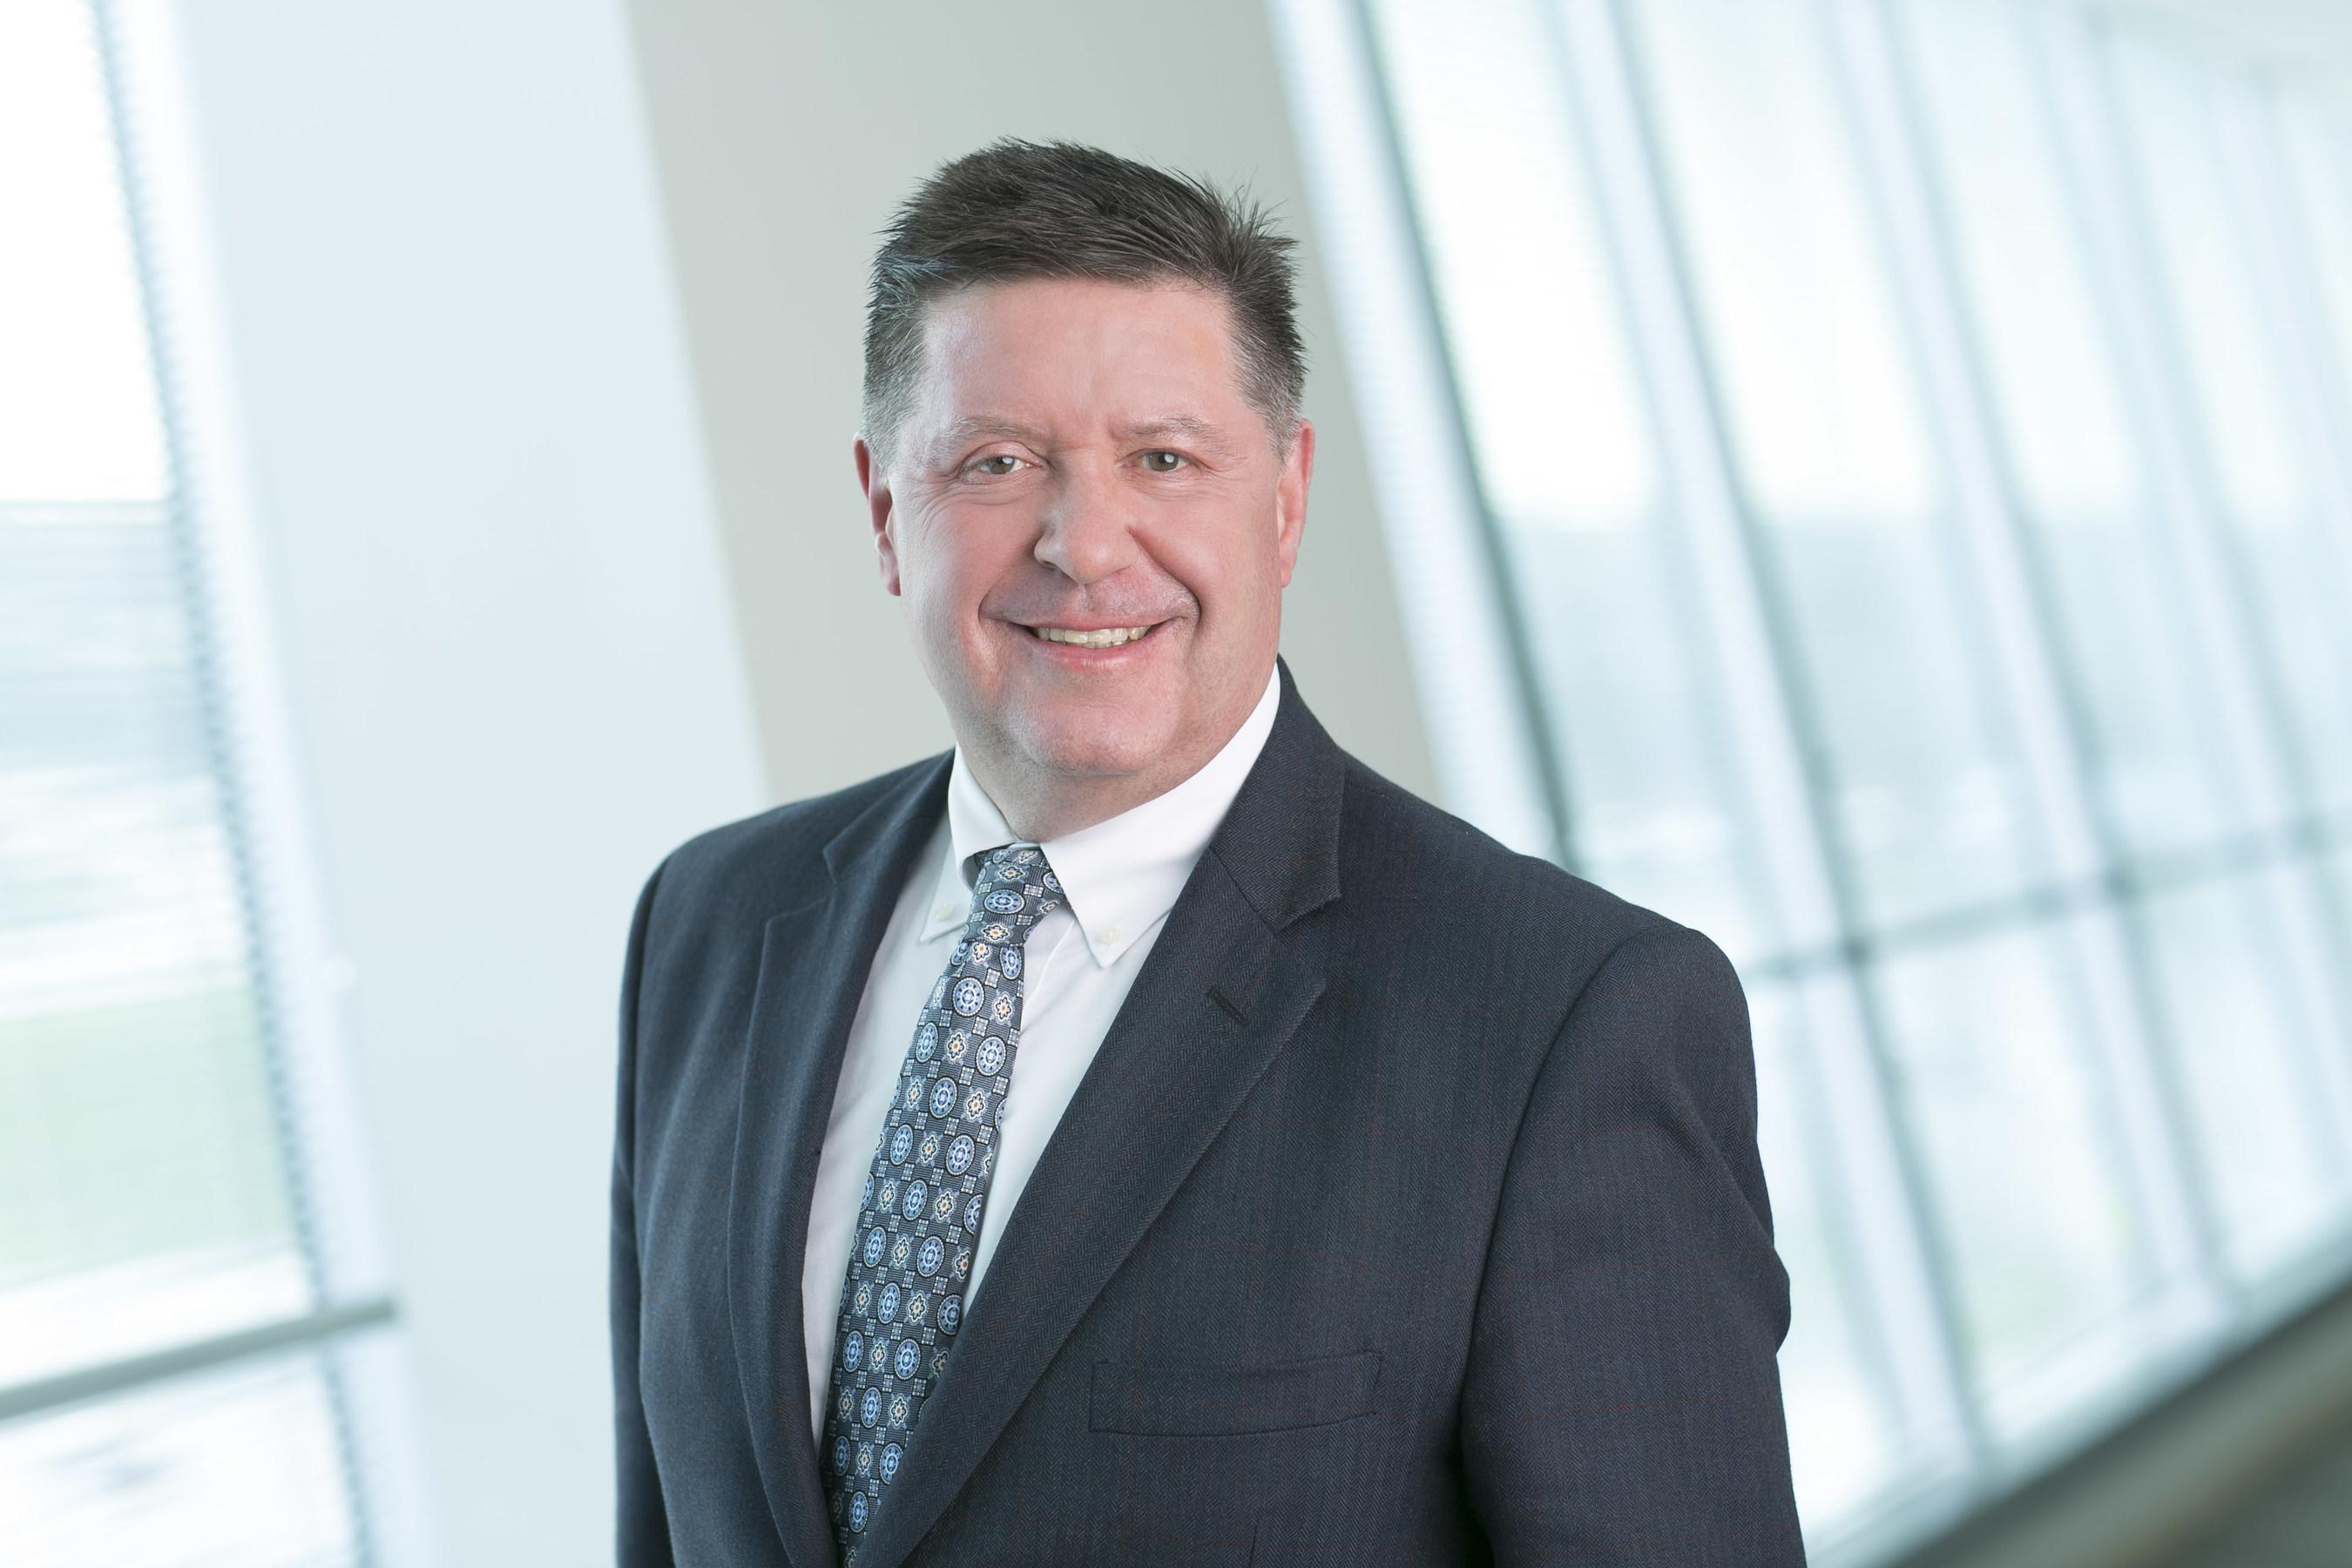 Mark Wanda named executive director, anti-bribery and anti-corruption at Astellas.